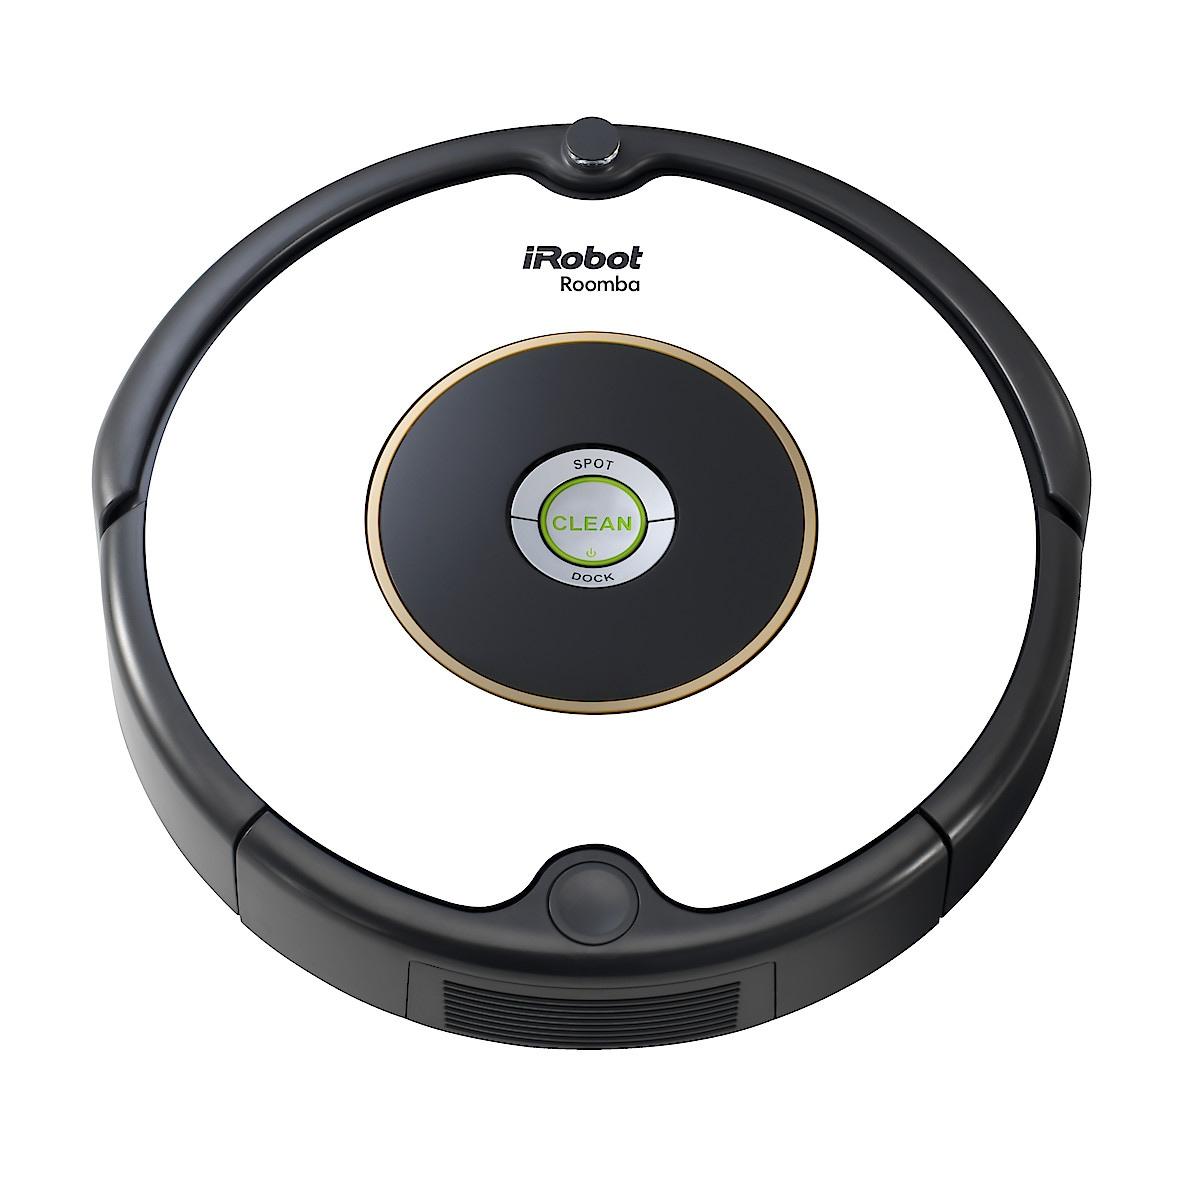 Robotstøvsuger iRobot Roomba 605